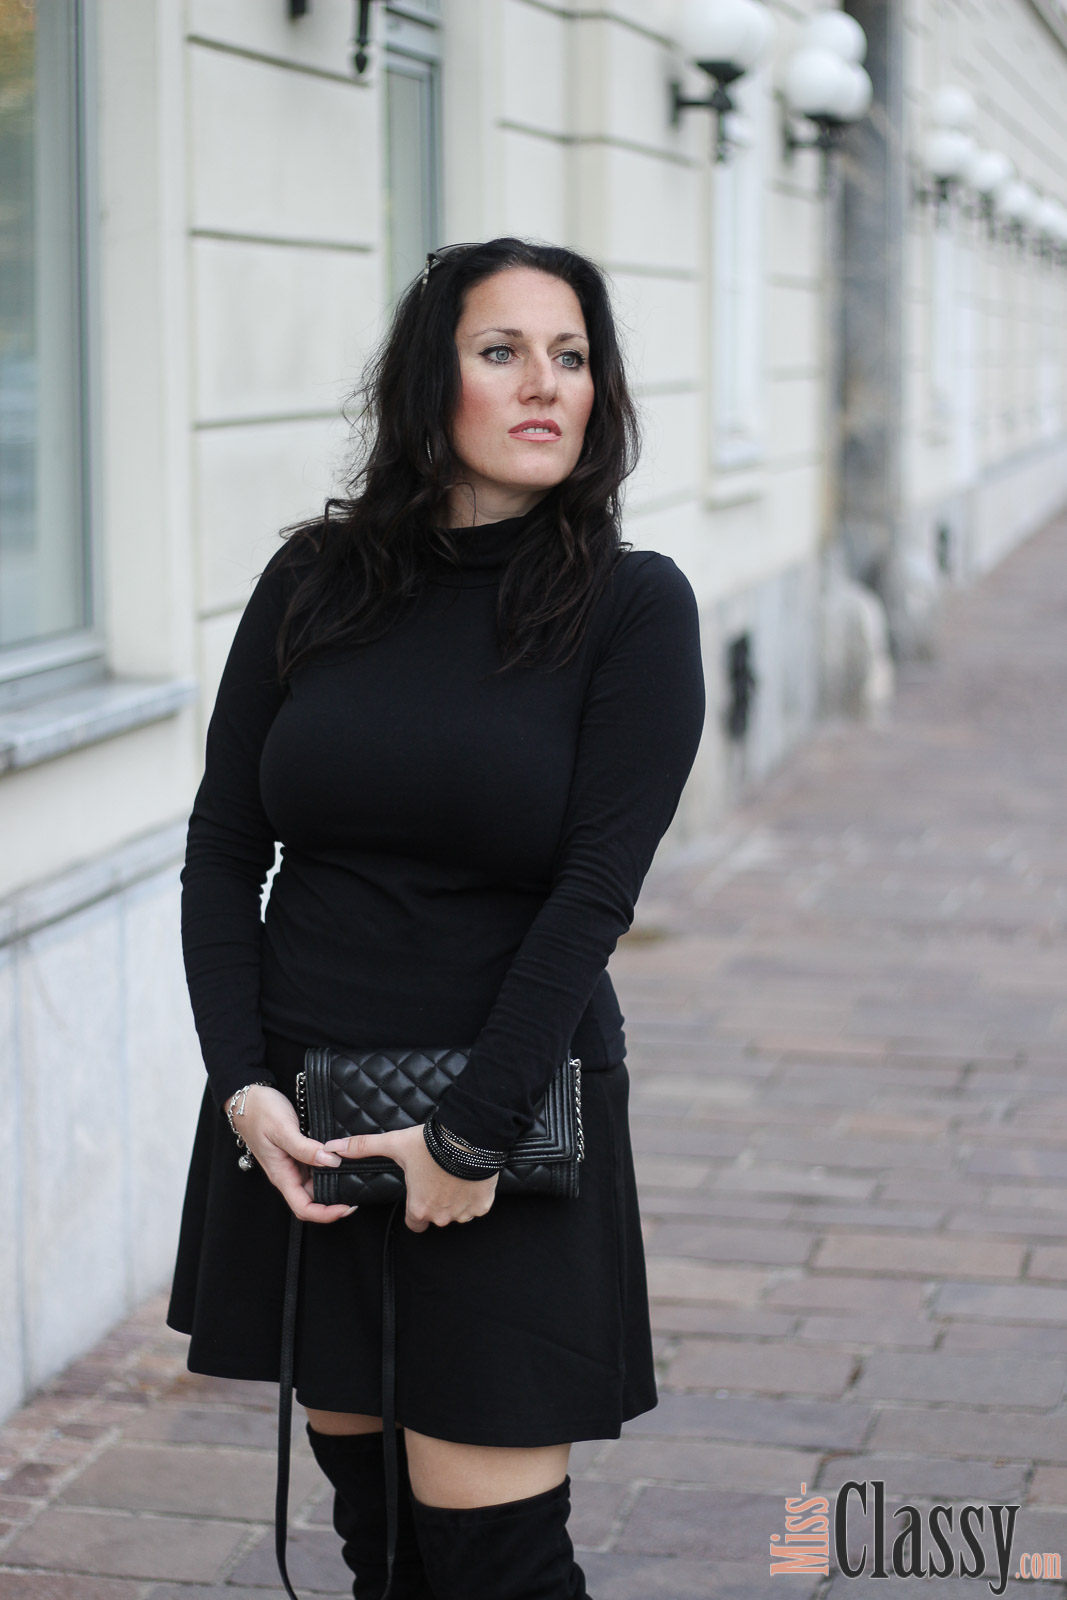 outfit schwarze overknees la miss classy f r 4stylez4u. Black Bedroom Furniture Sets. Home Design Ideas